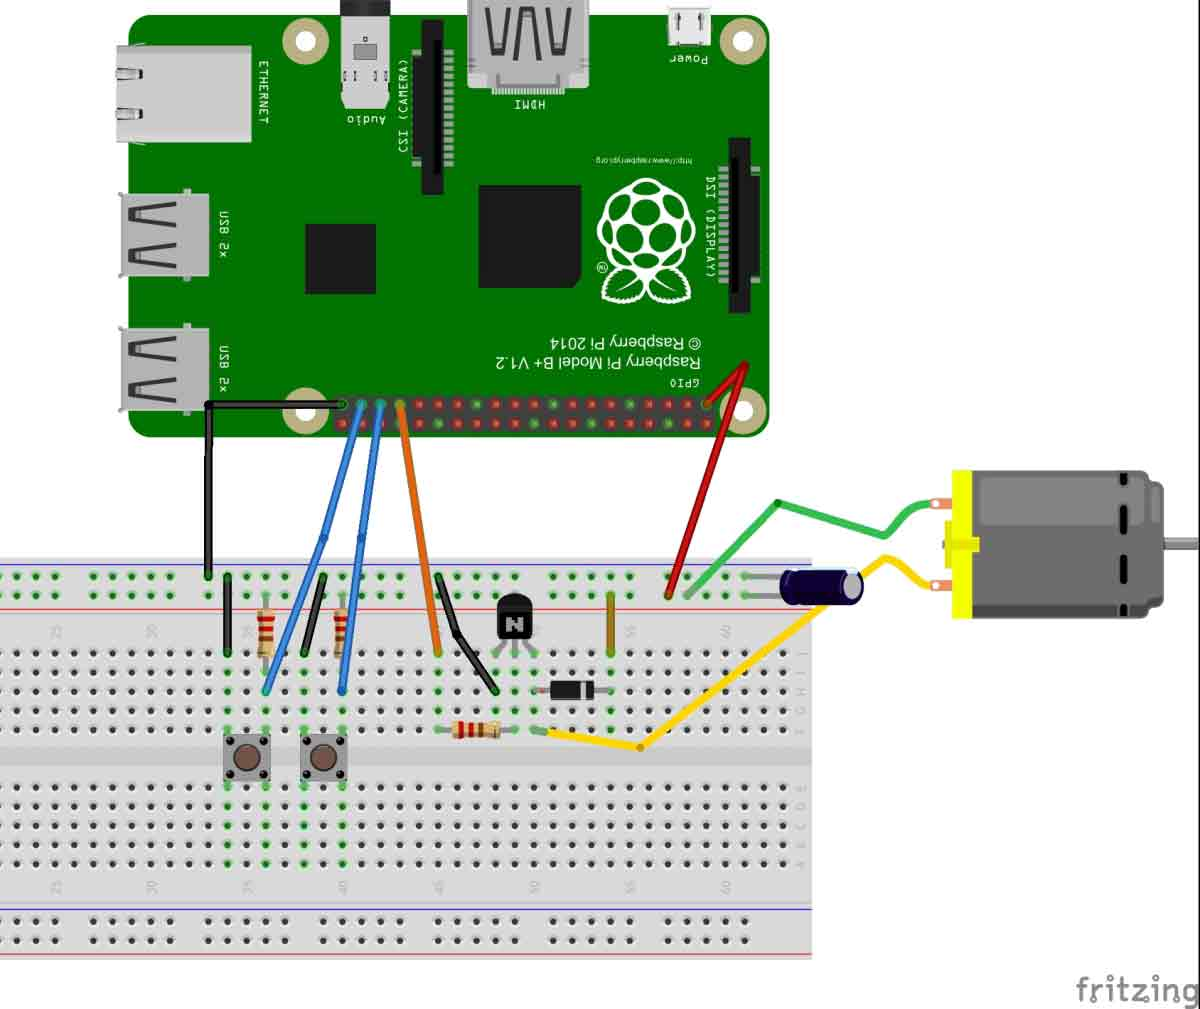 raspberry pi 3 model b wiring diagram squash court circuit best library 12v solenoid 40 pinout